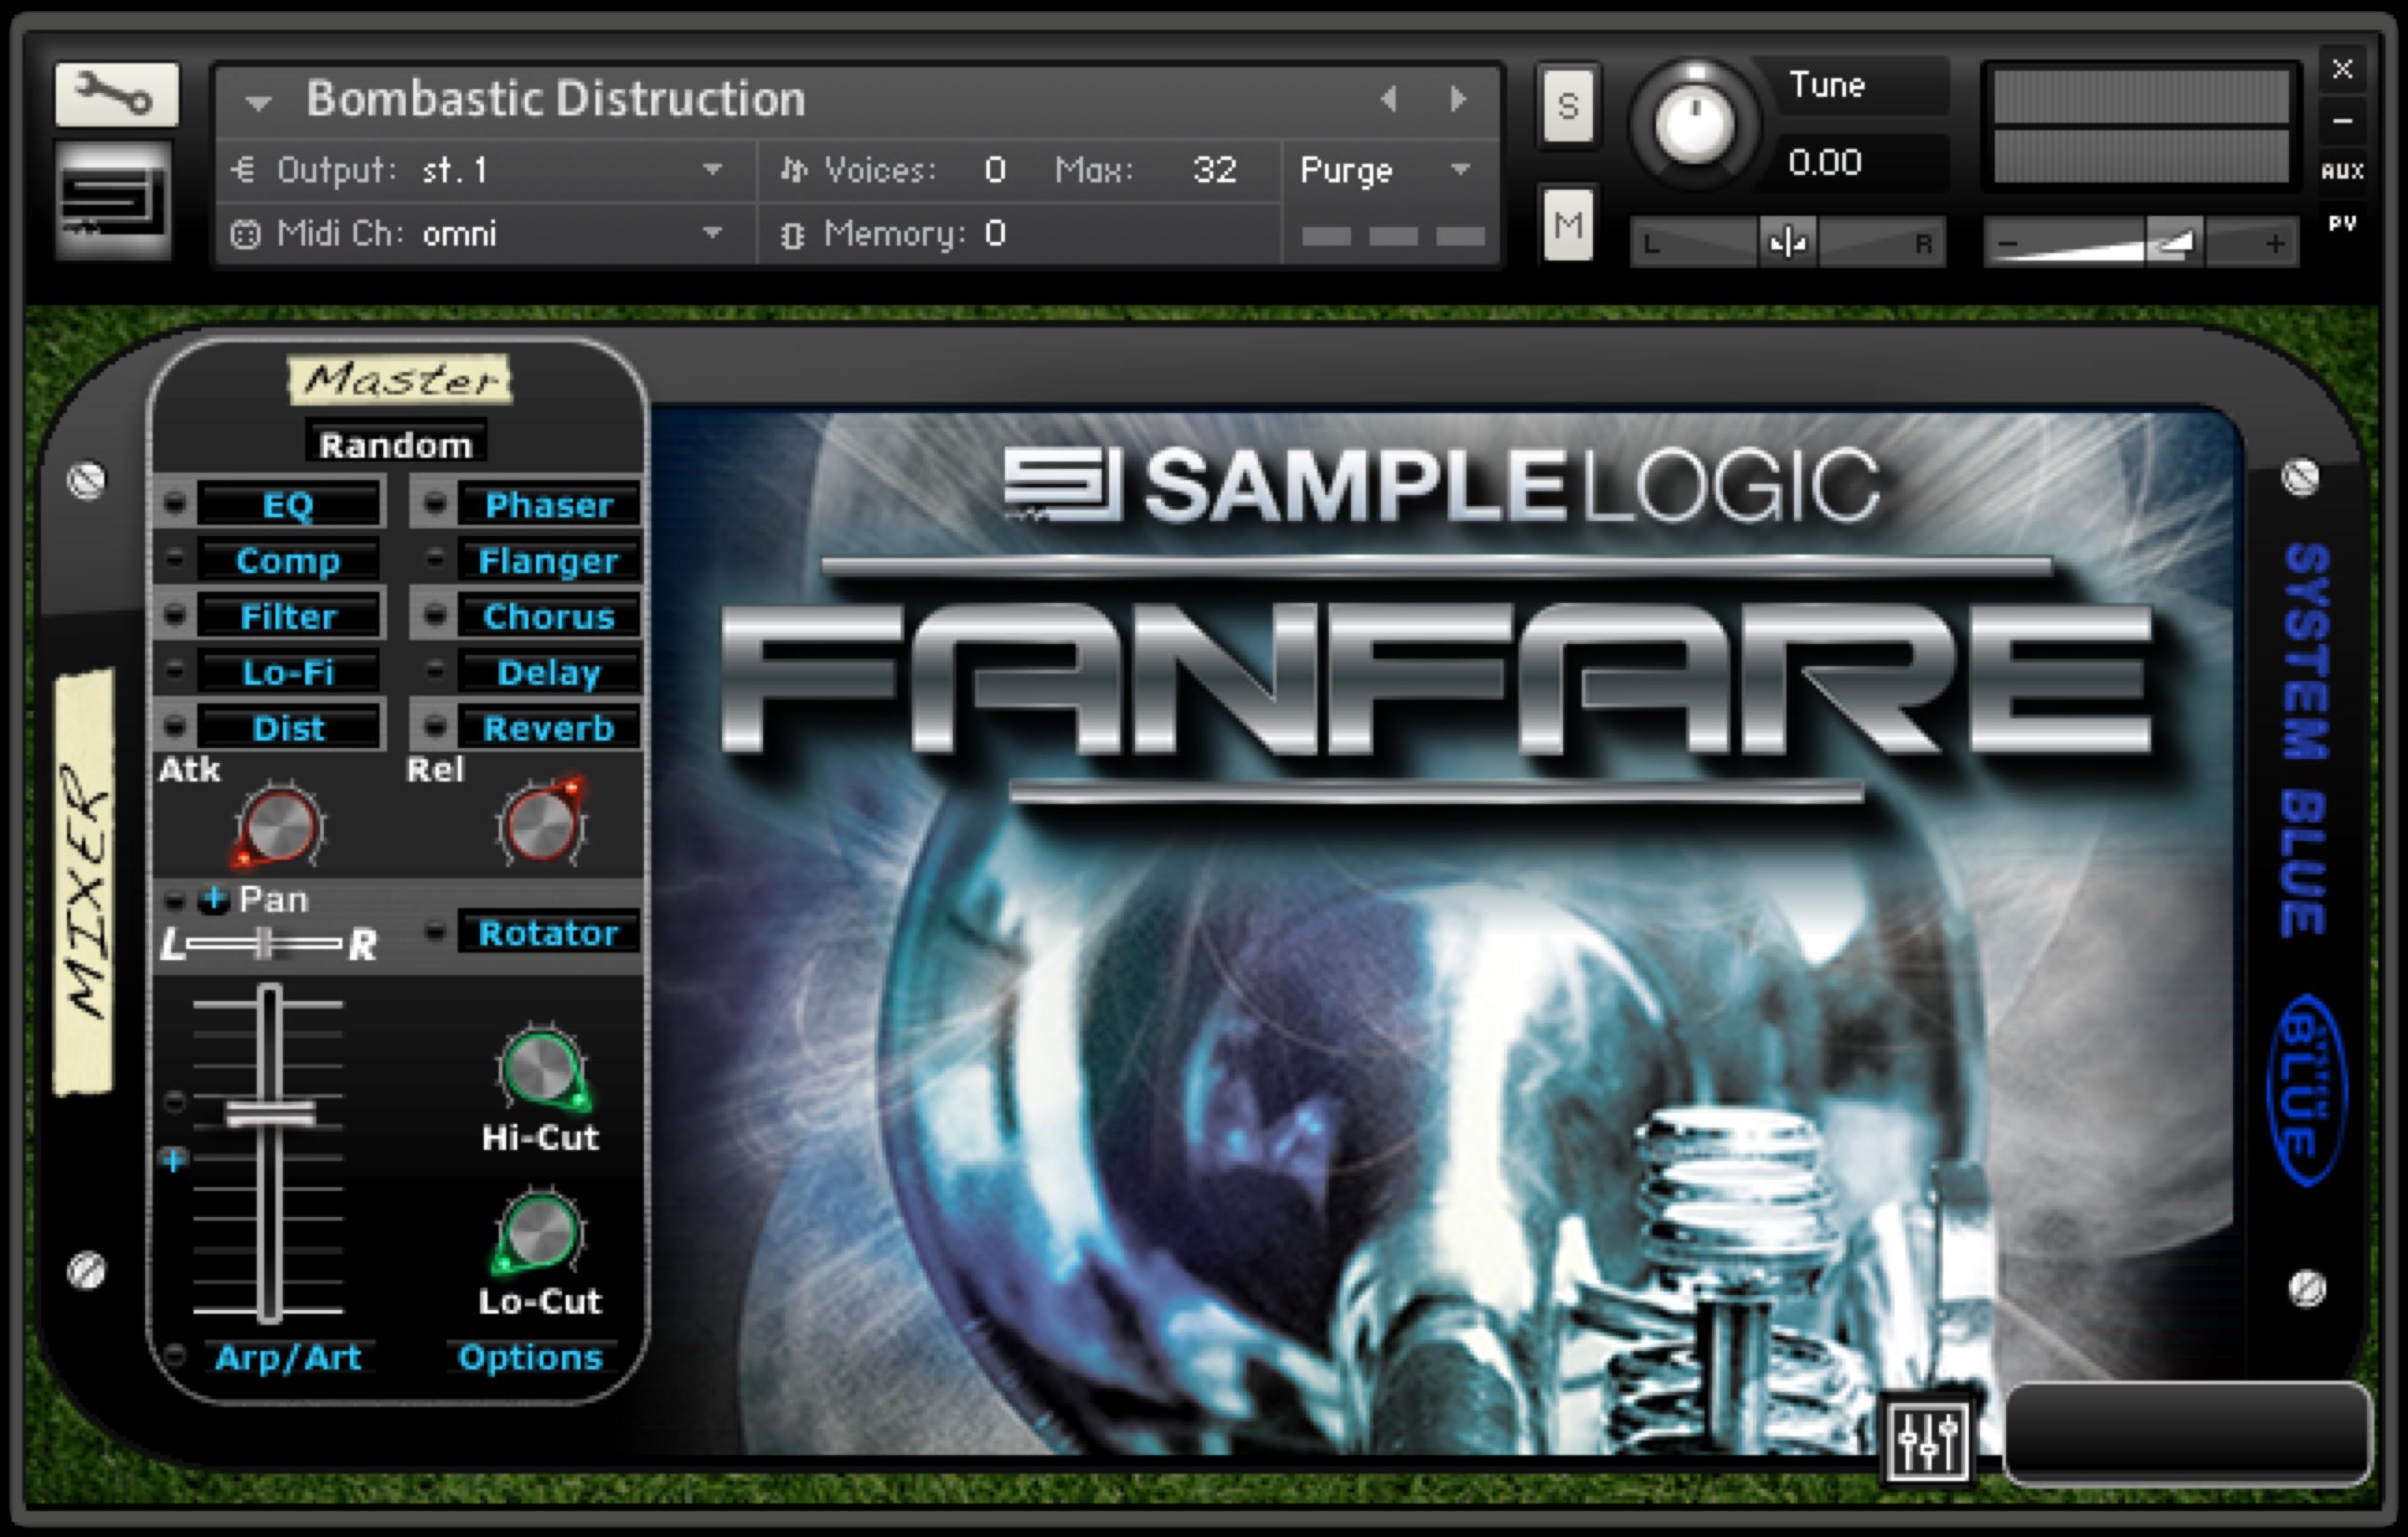 sample logic fanfare